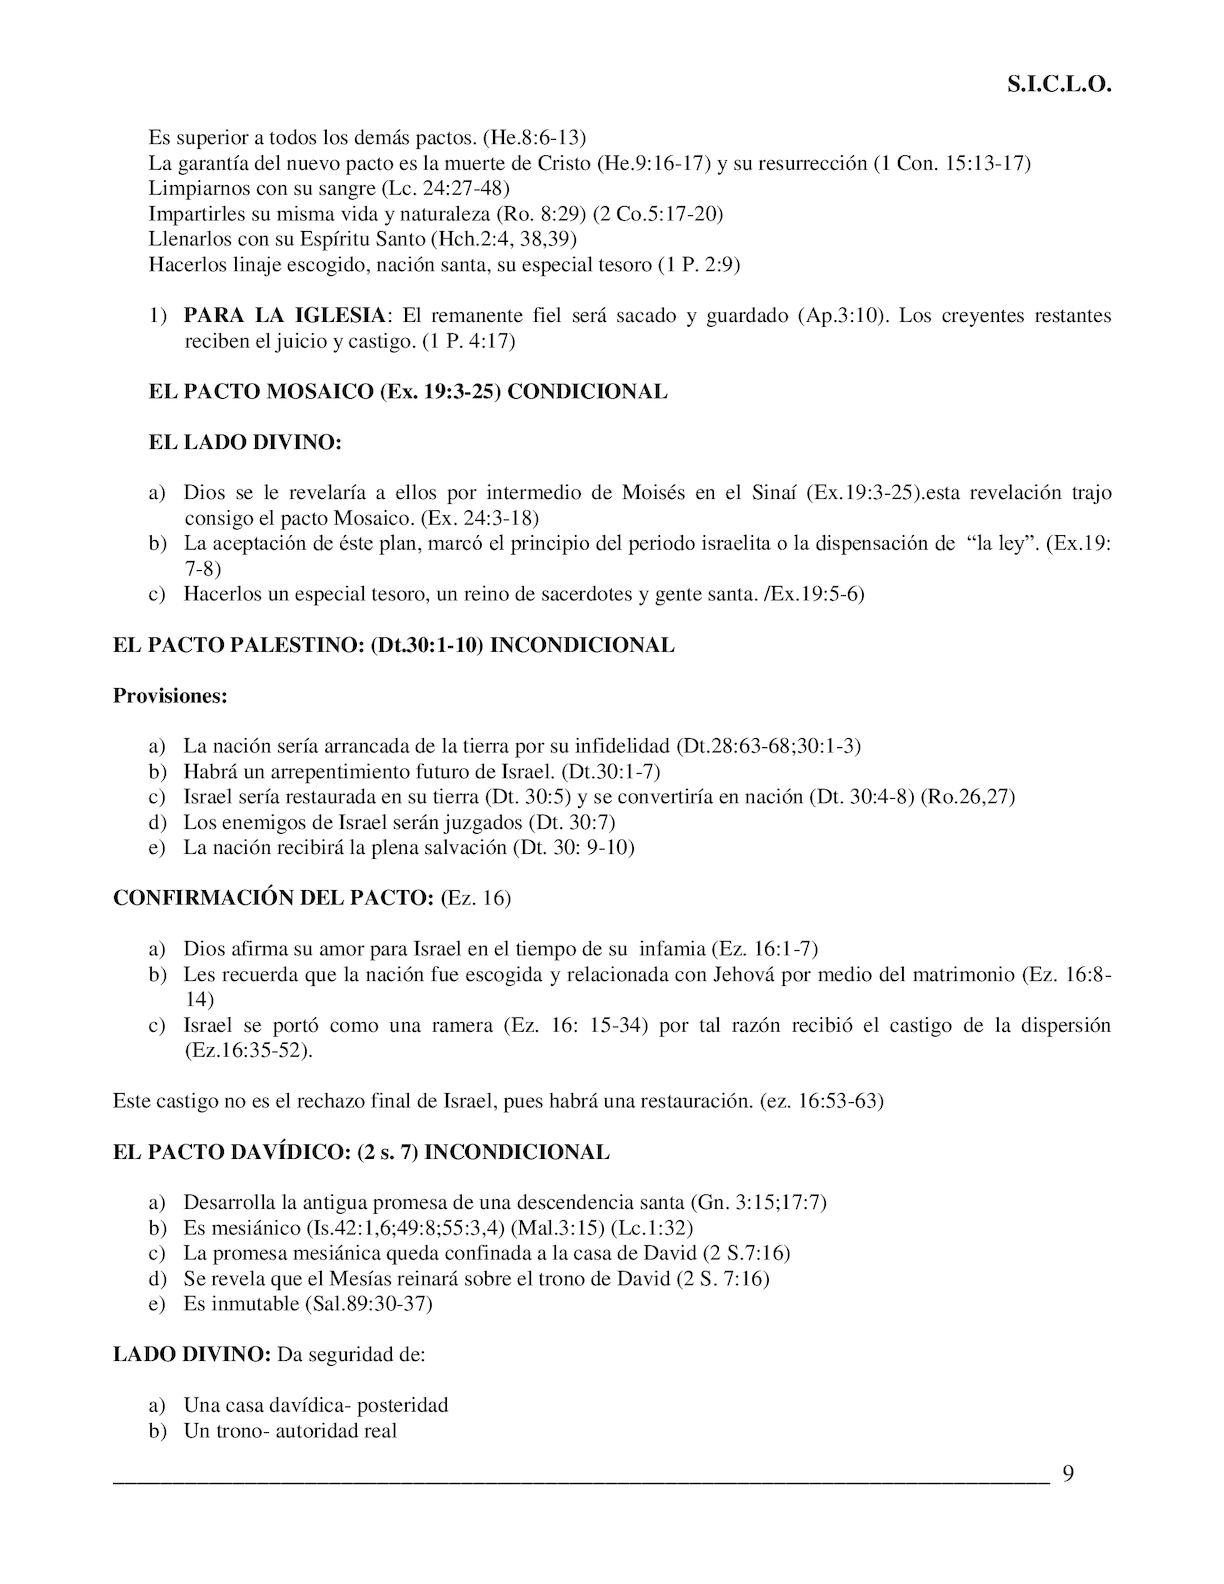 7 Dispensaciones Fase Ii - CALAMEO Downloader